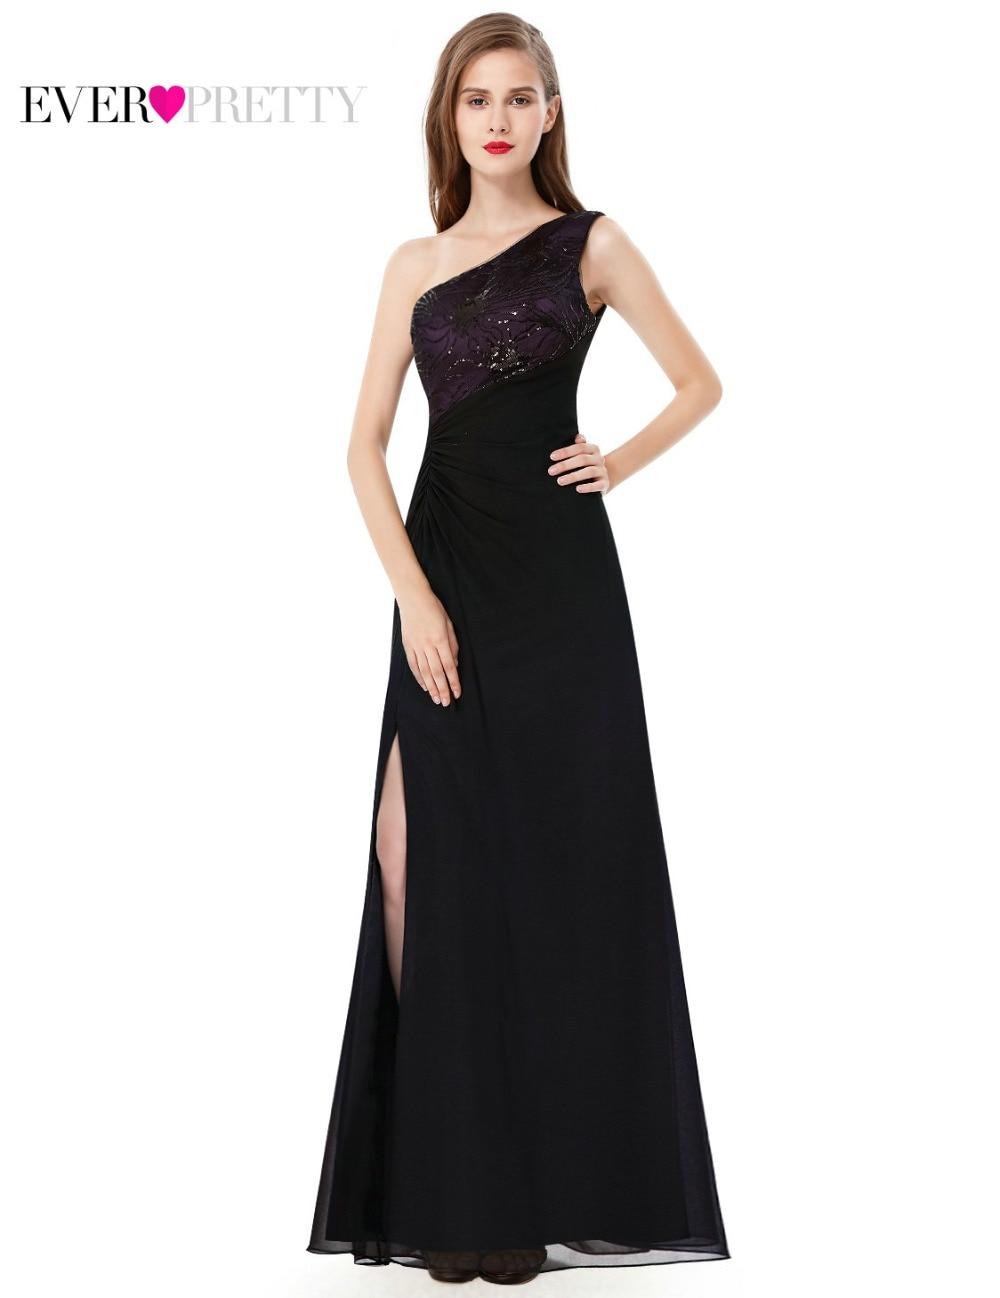 Lentejuelas gasa prom dress siempre pretty he08590 negro elegante de un hombro p